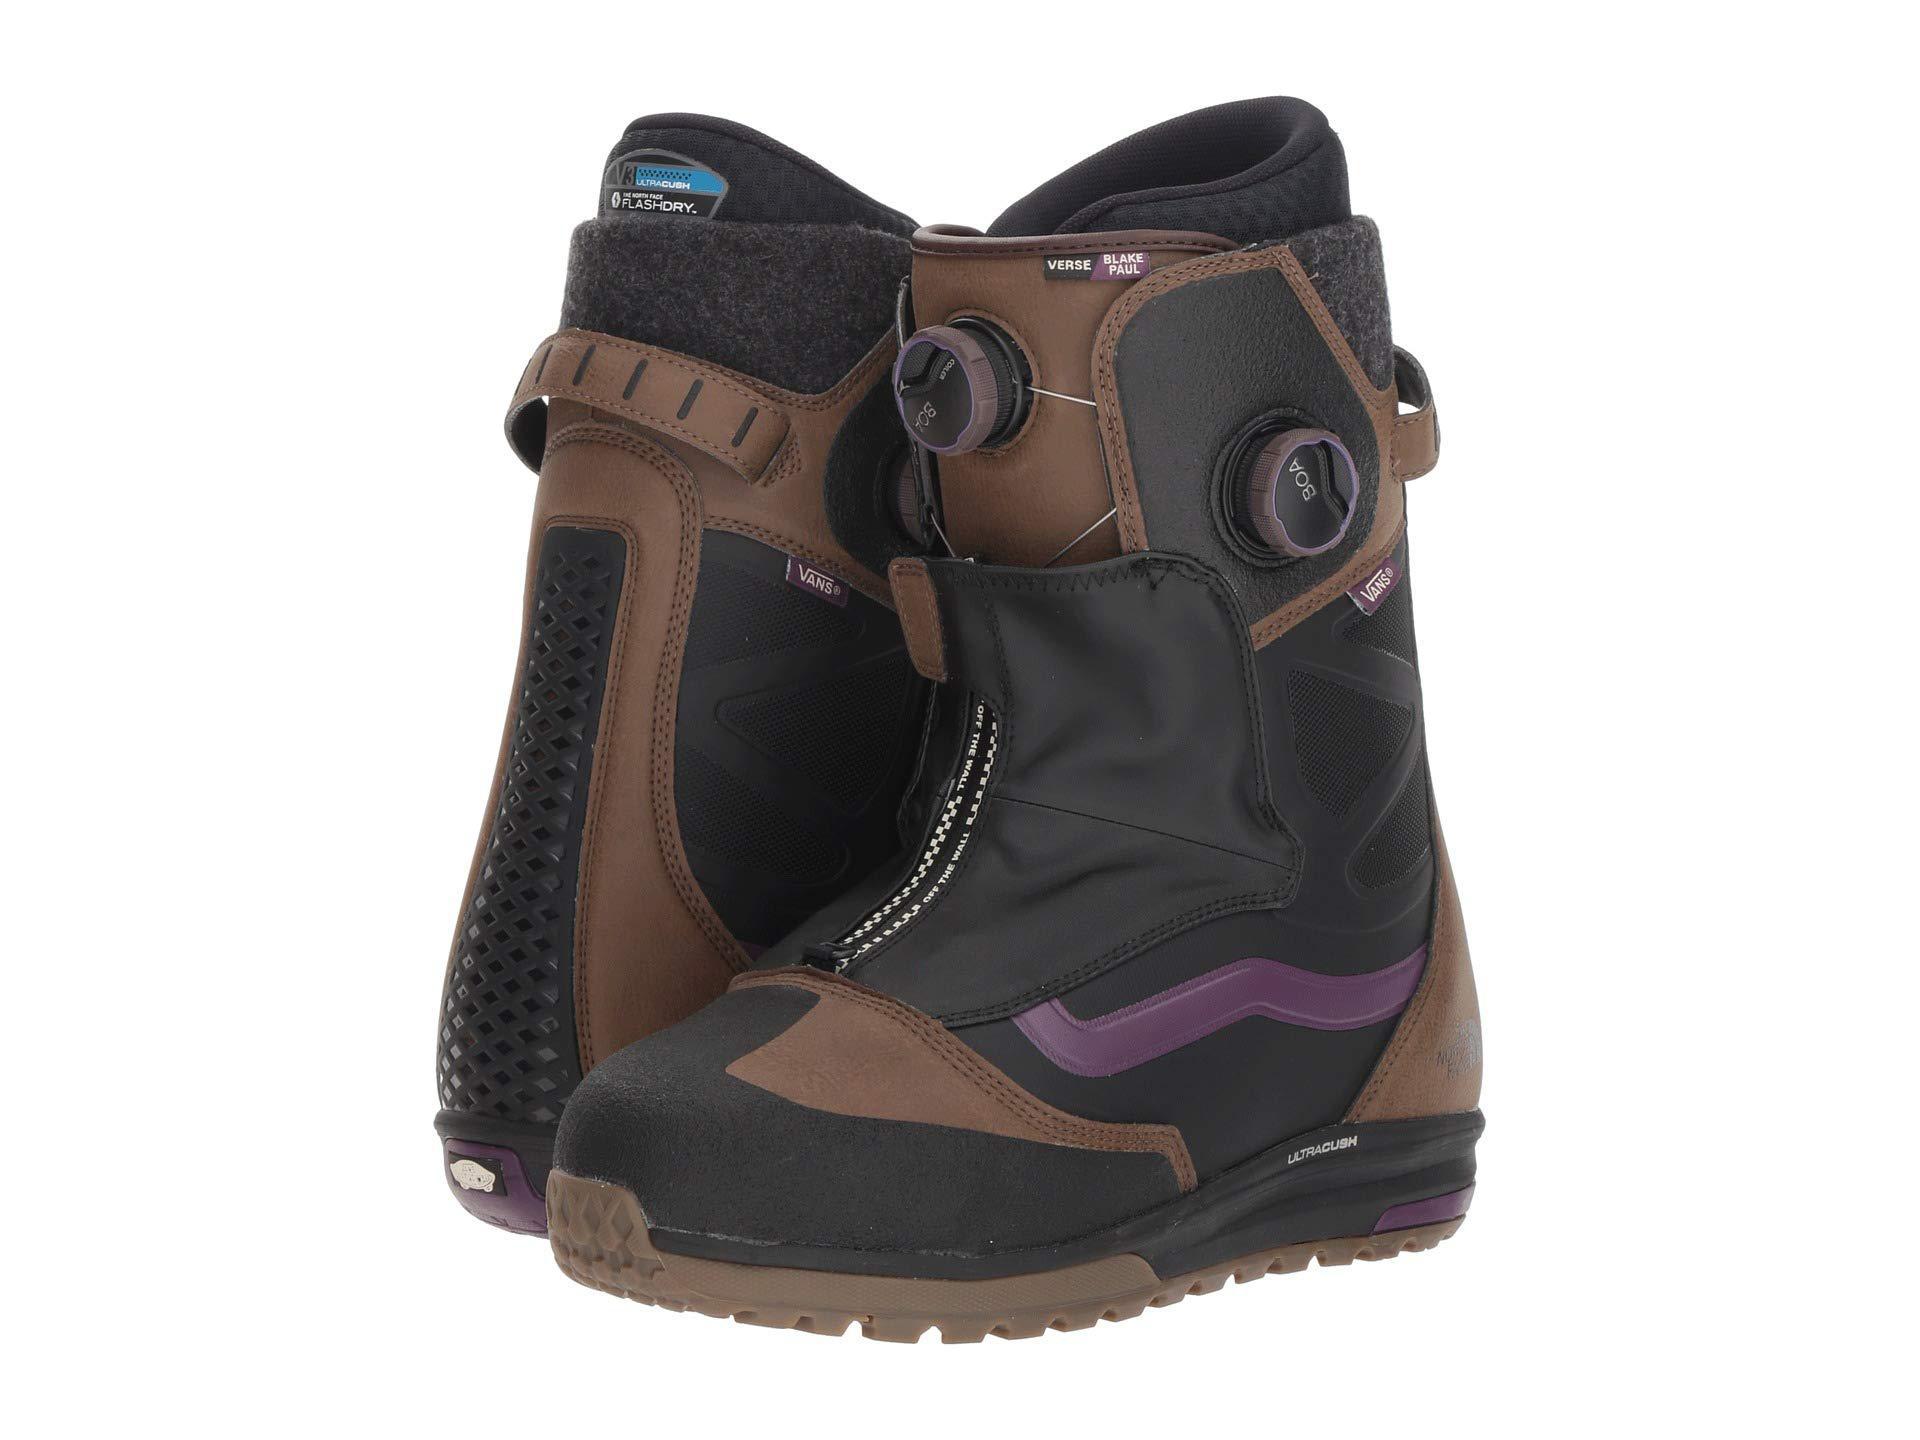 49e918aa04 Lyst - Vans Versetm  18 (brown purple (tnf blake Paul)) Men s Snow ...